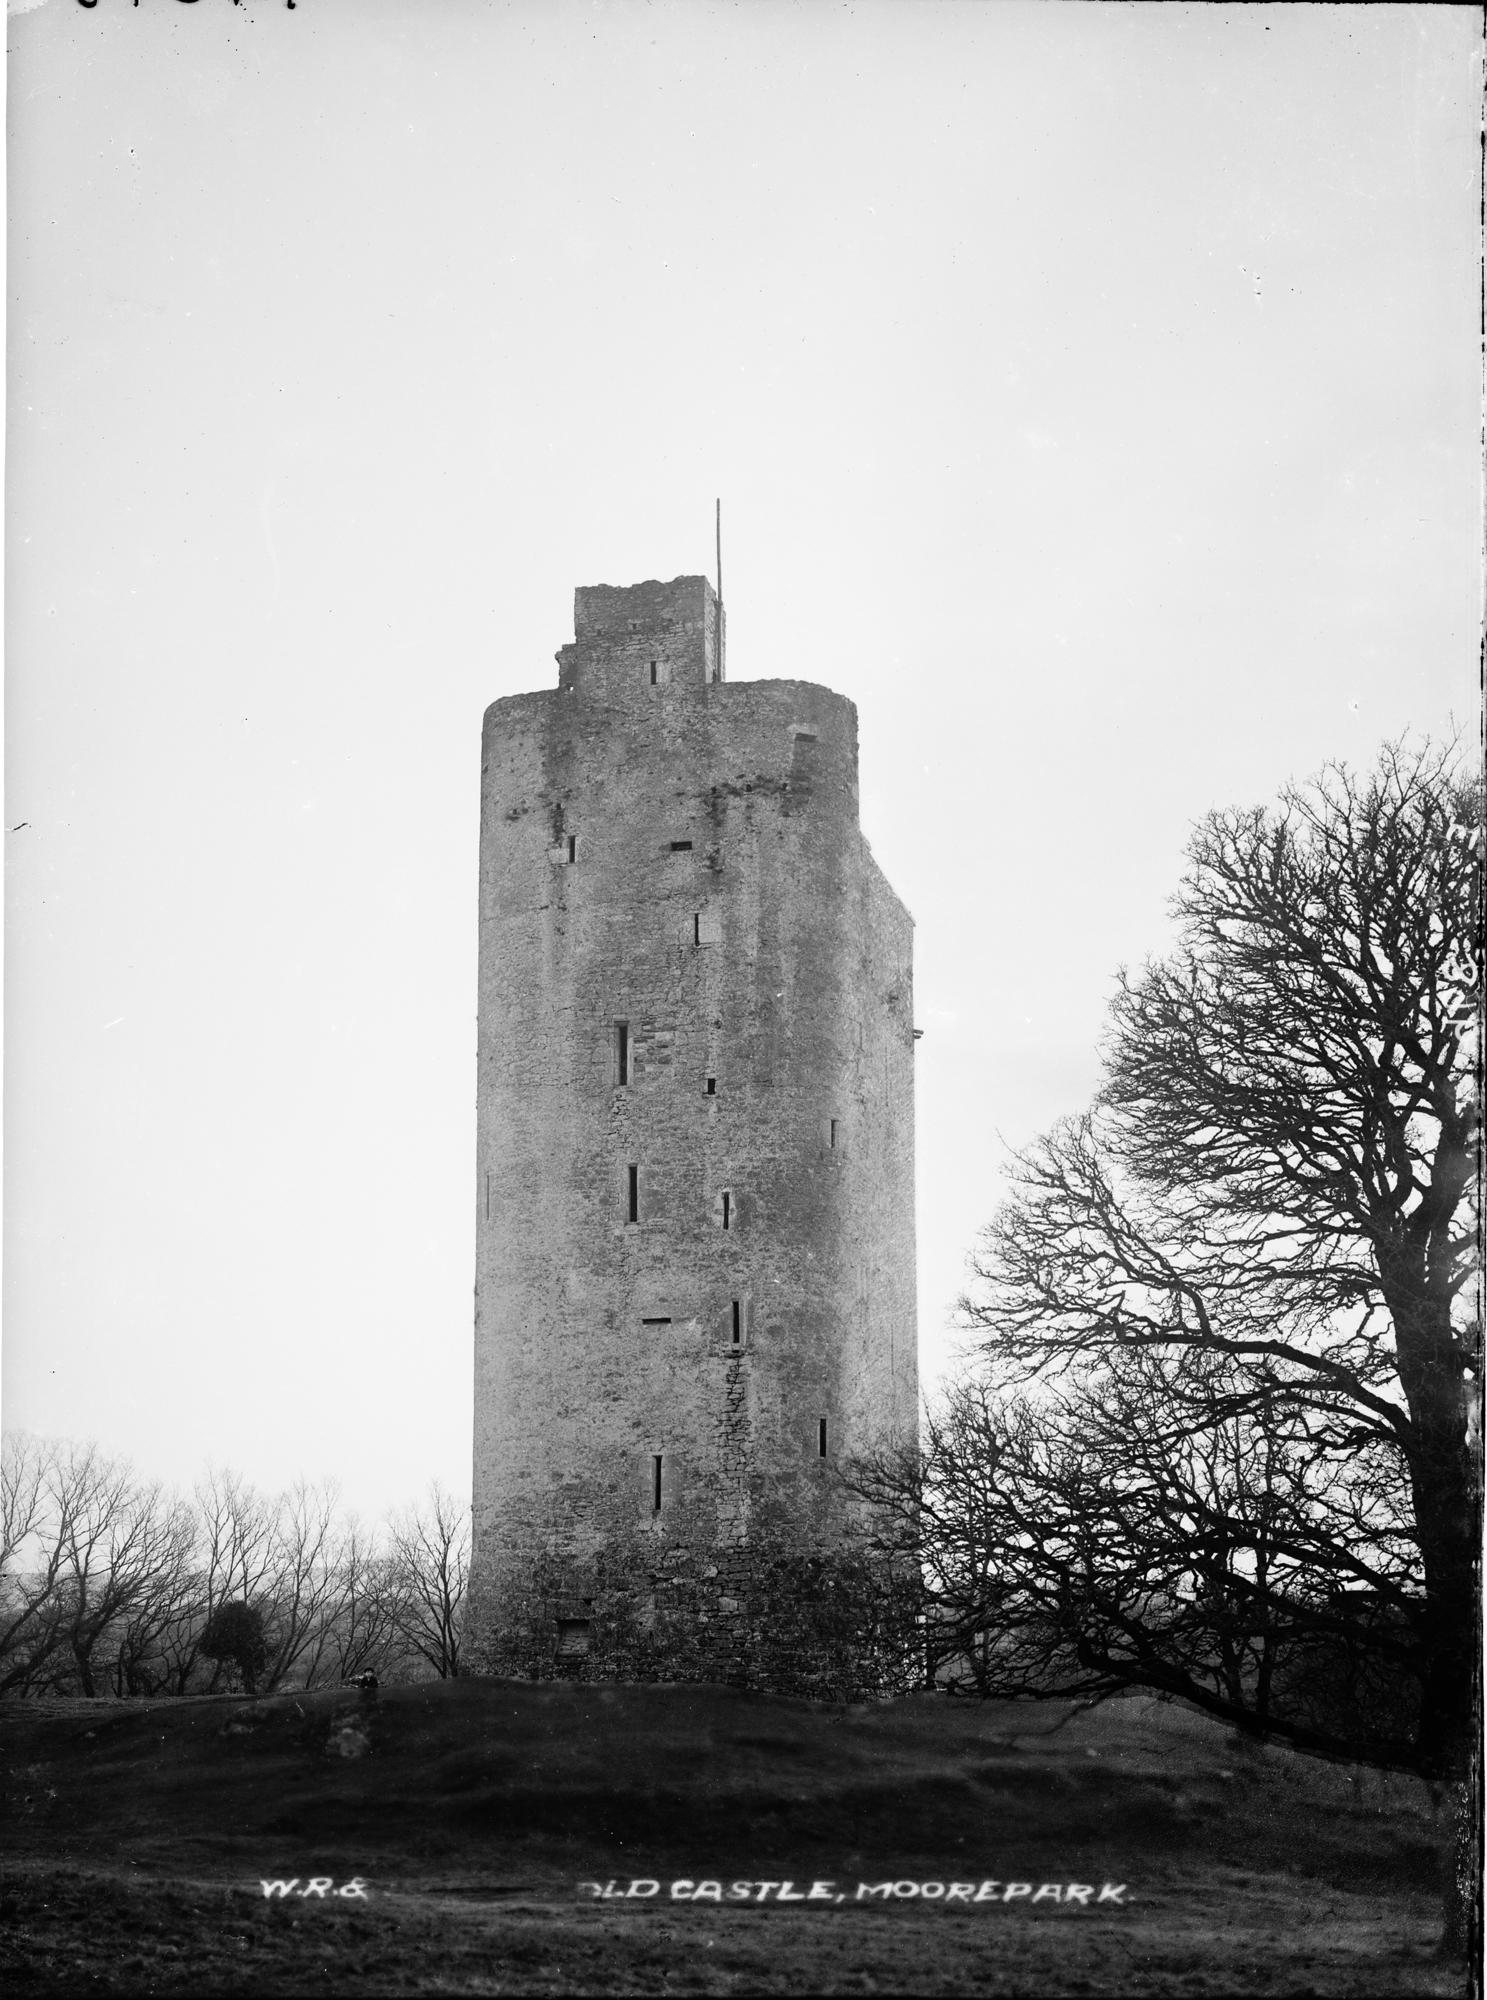 Cloghleigh Castle, Moorepark, Fermoy, Co. Cork